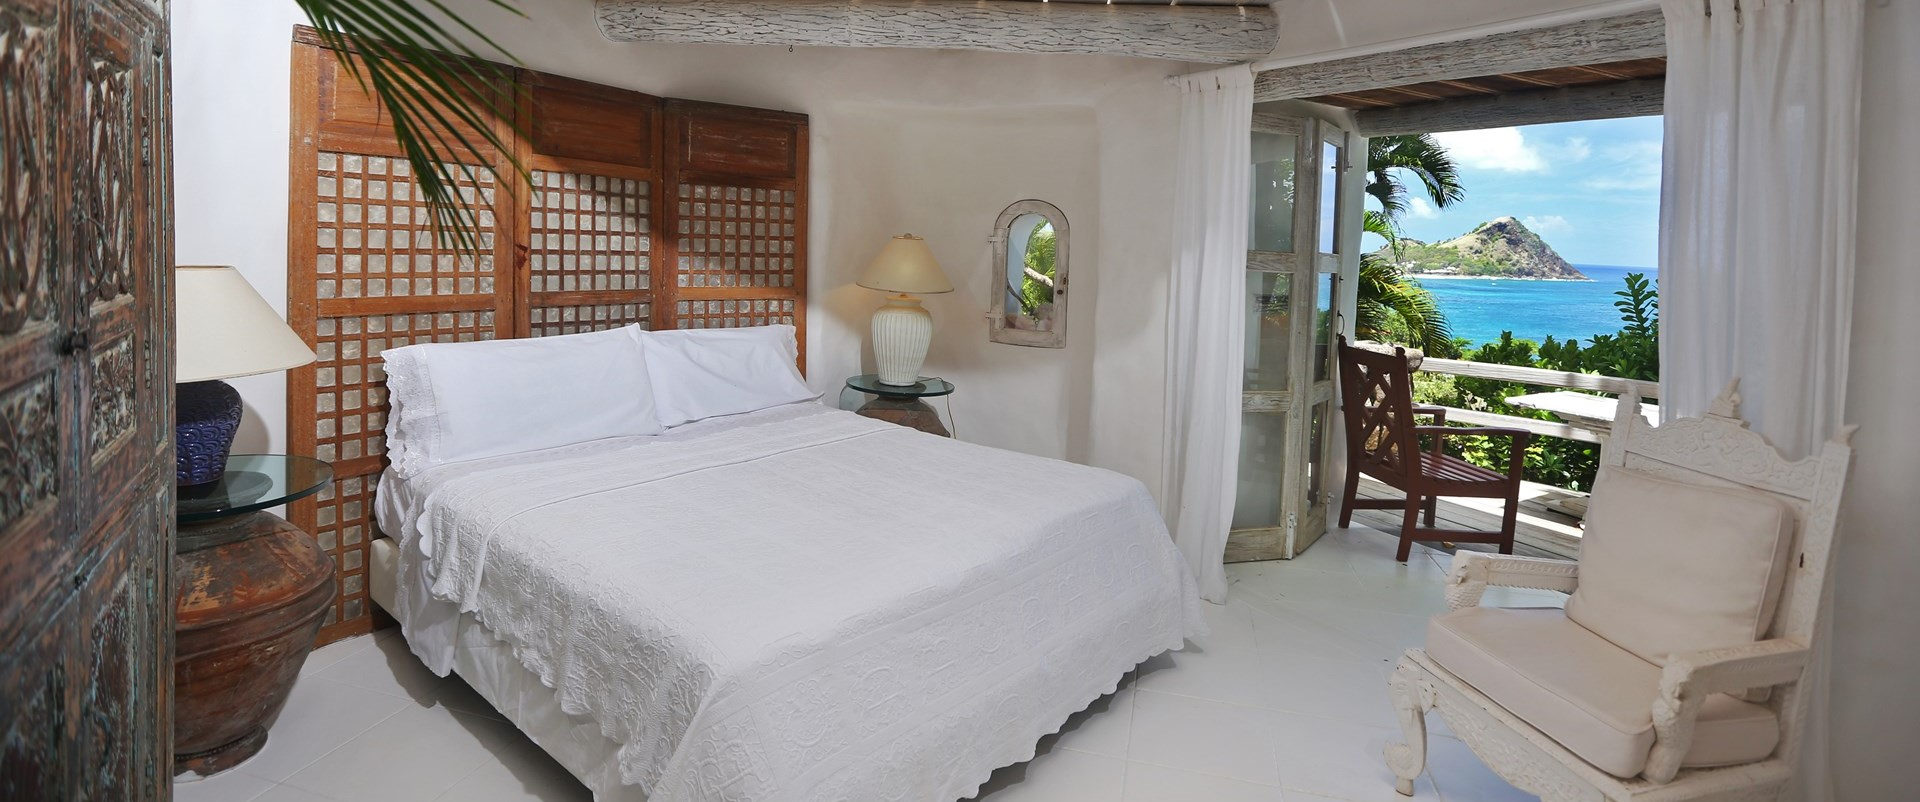 smugglers-nest-villa-double-bedroom-2